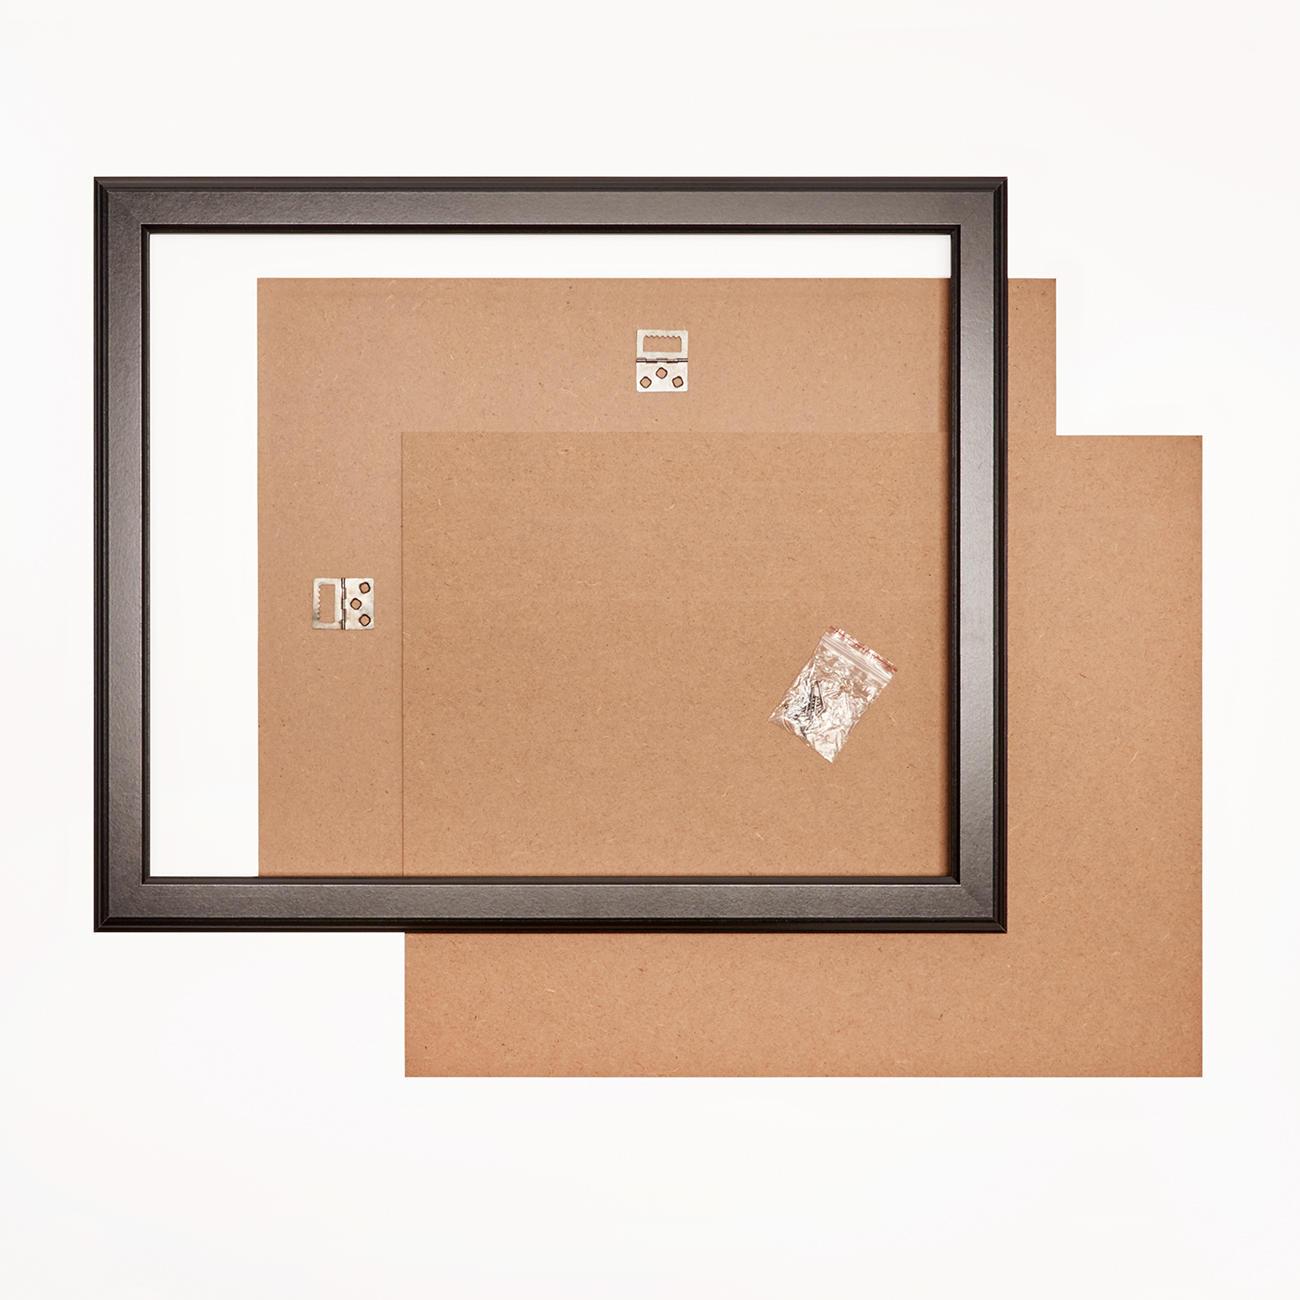 bilderrahmen schwarz verschiedene gr ssen. Black Bedroom Furniture Sets. Home Design Ideas